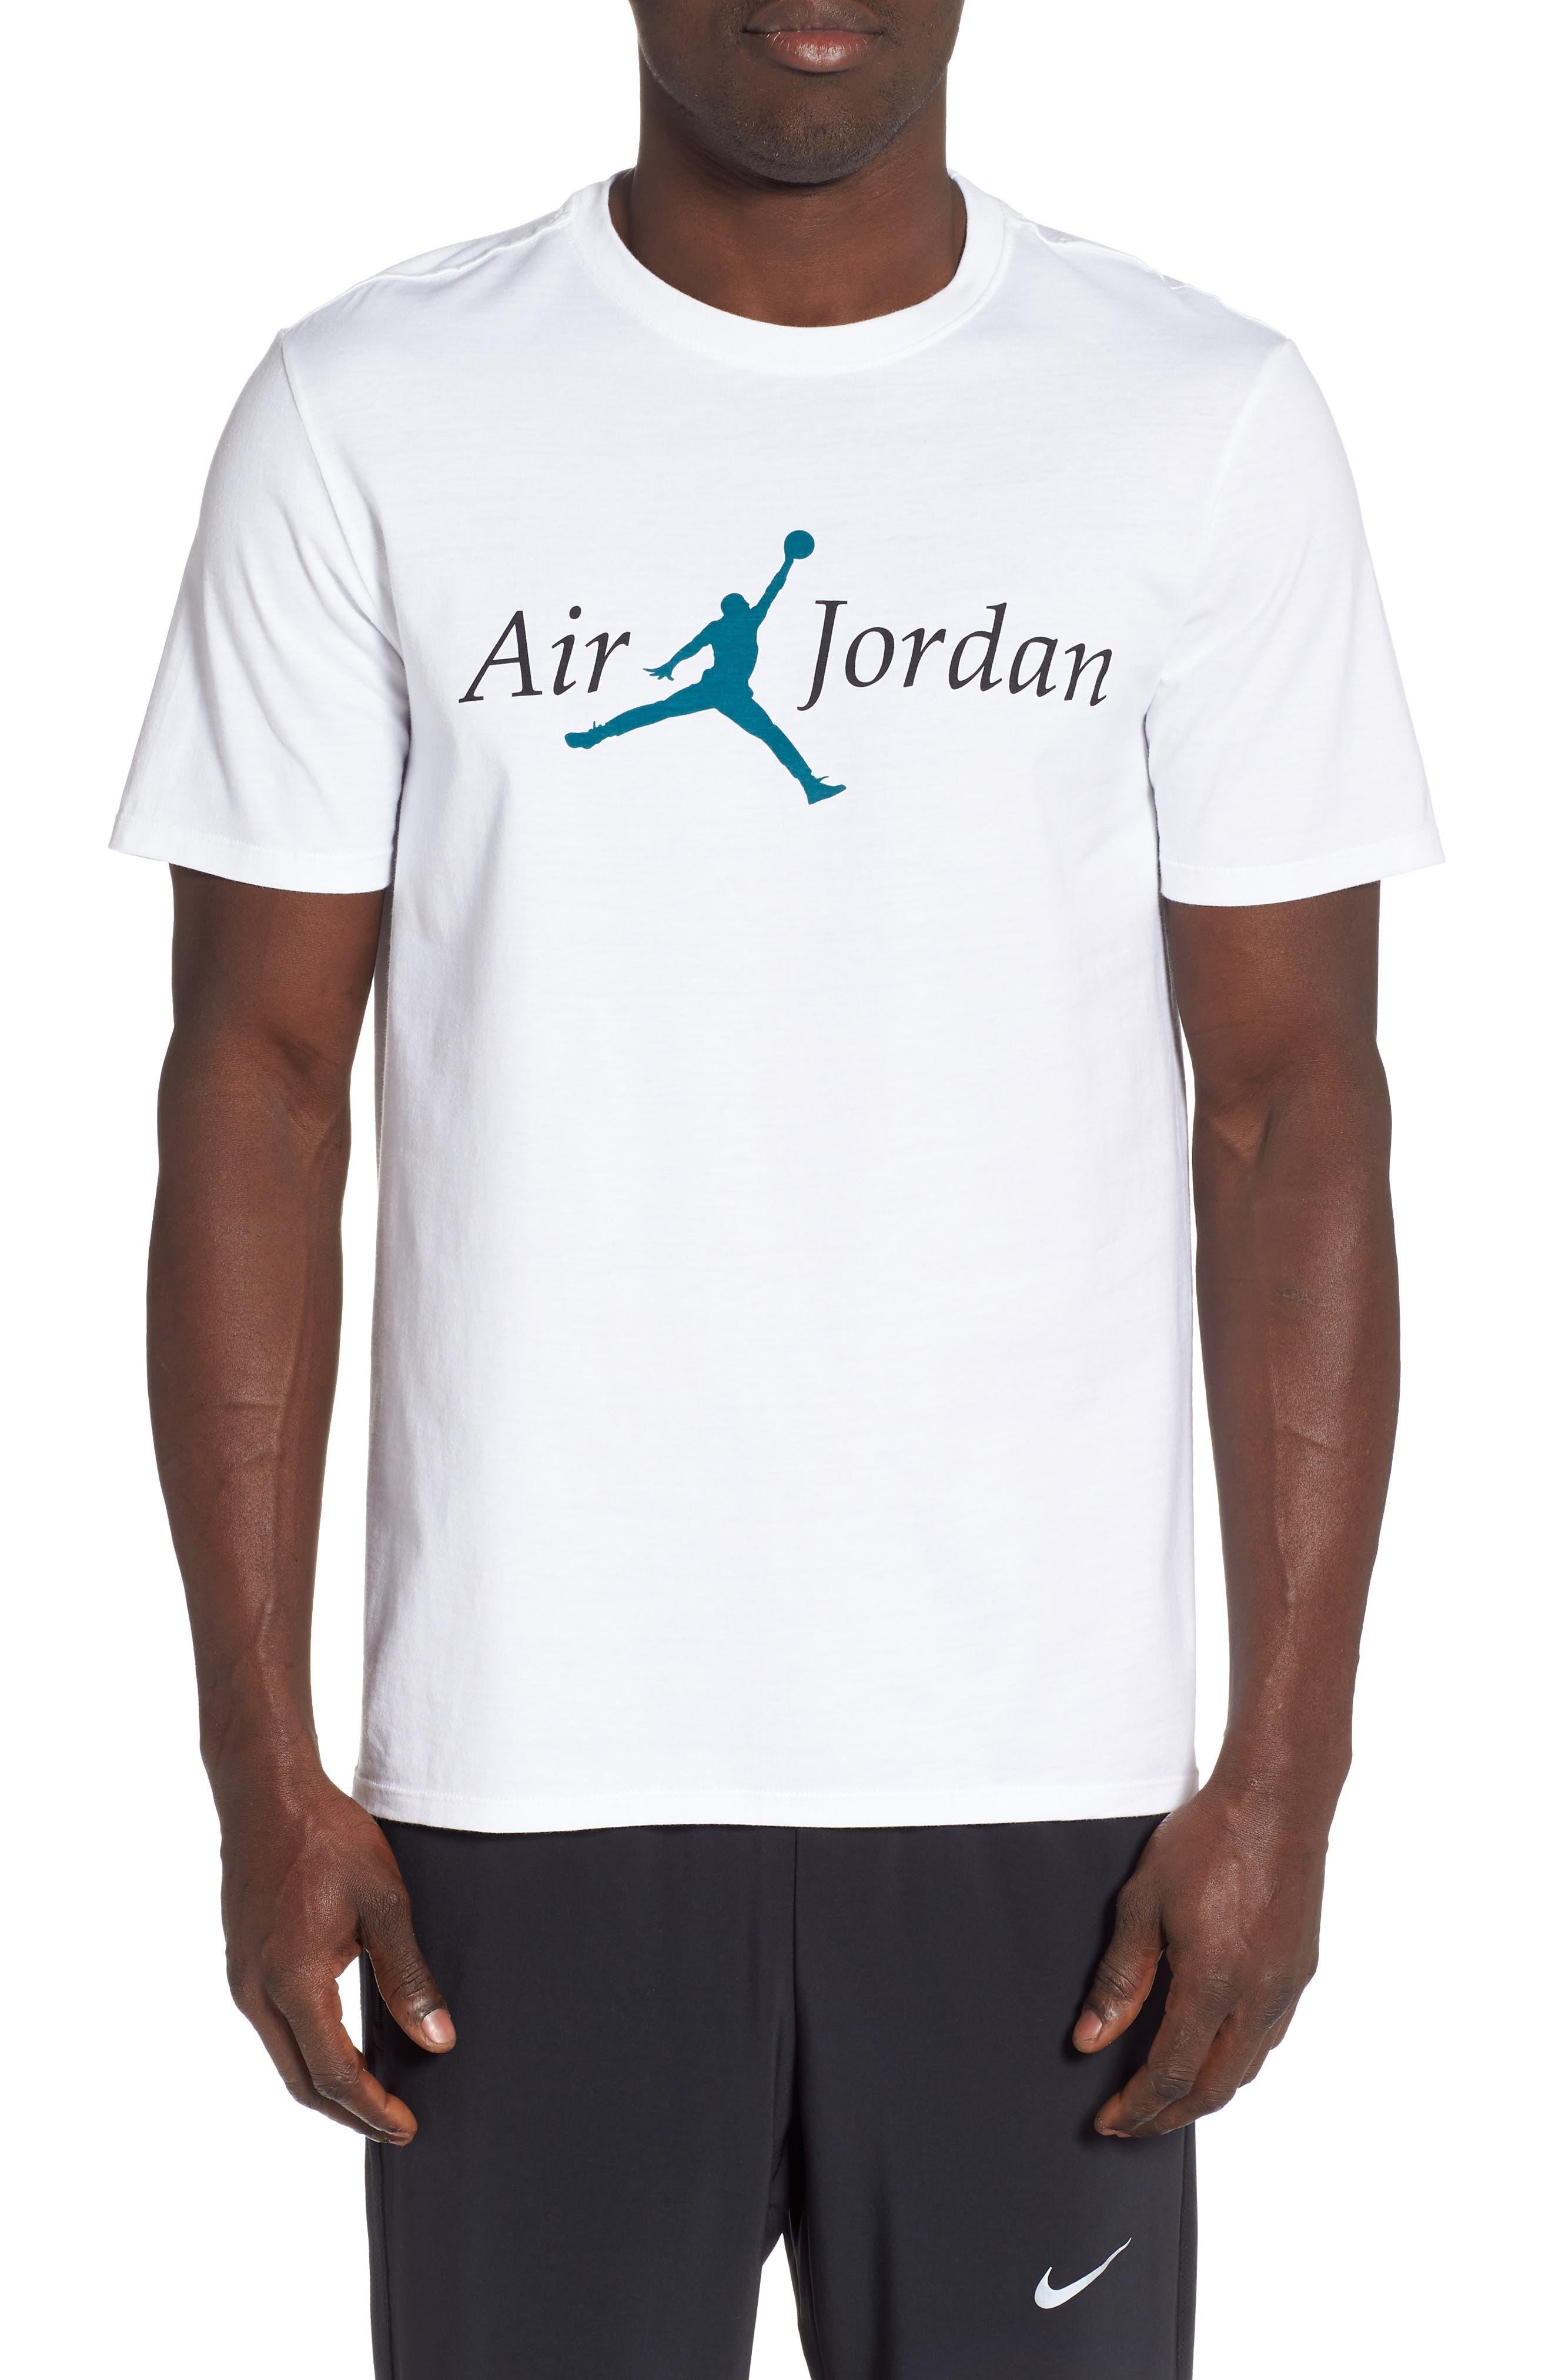 Nike Jordan Air Jordan 5 Graphic T-Shirt White